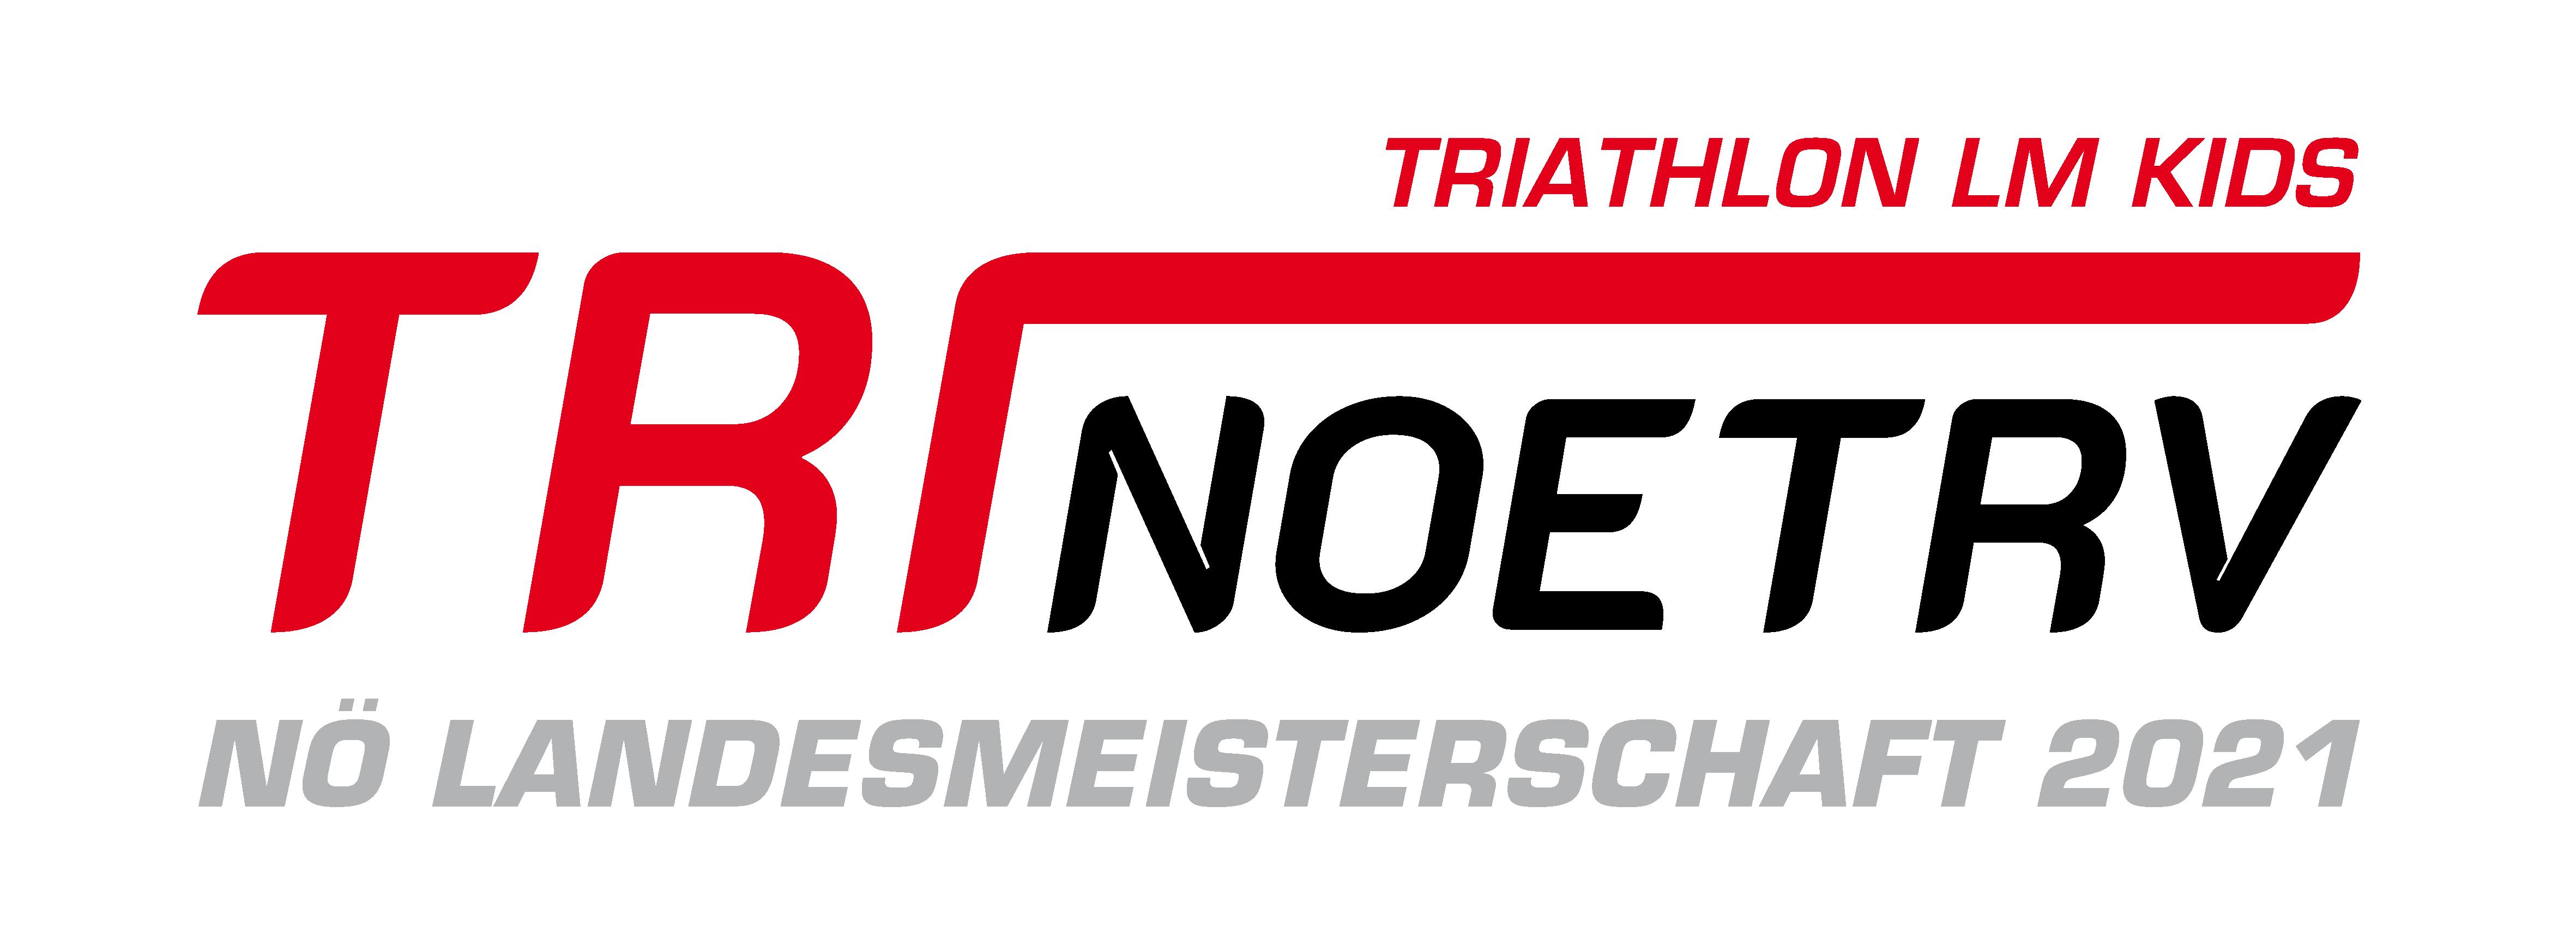 TRINOETRV2021_LM_Logo_Triathlon_LM_Kids_hell